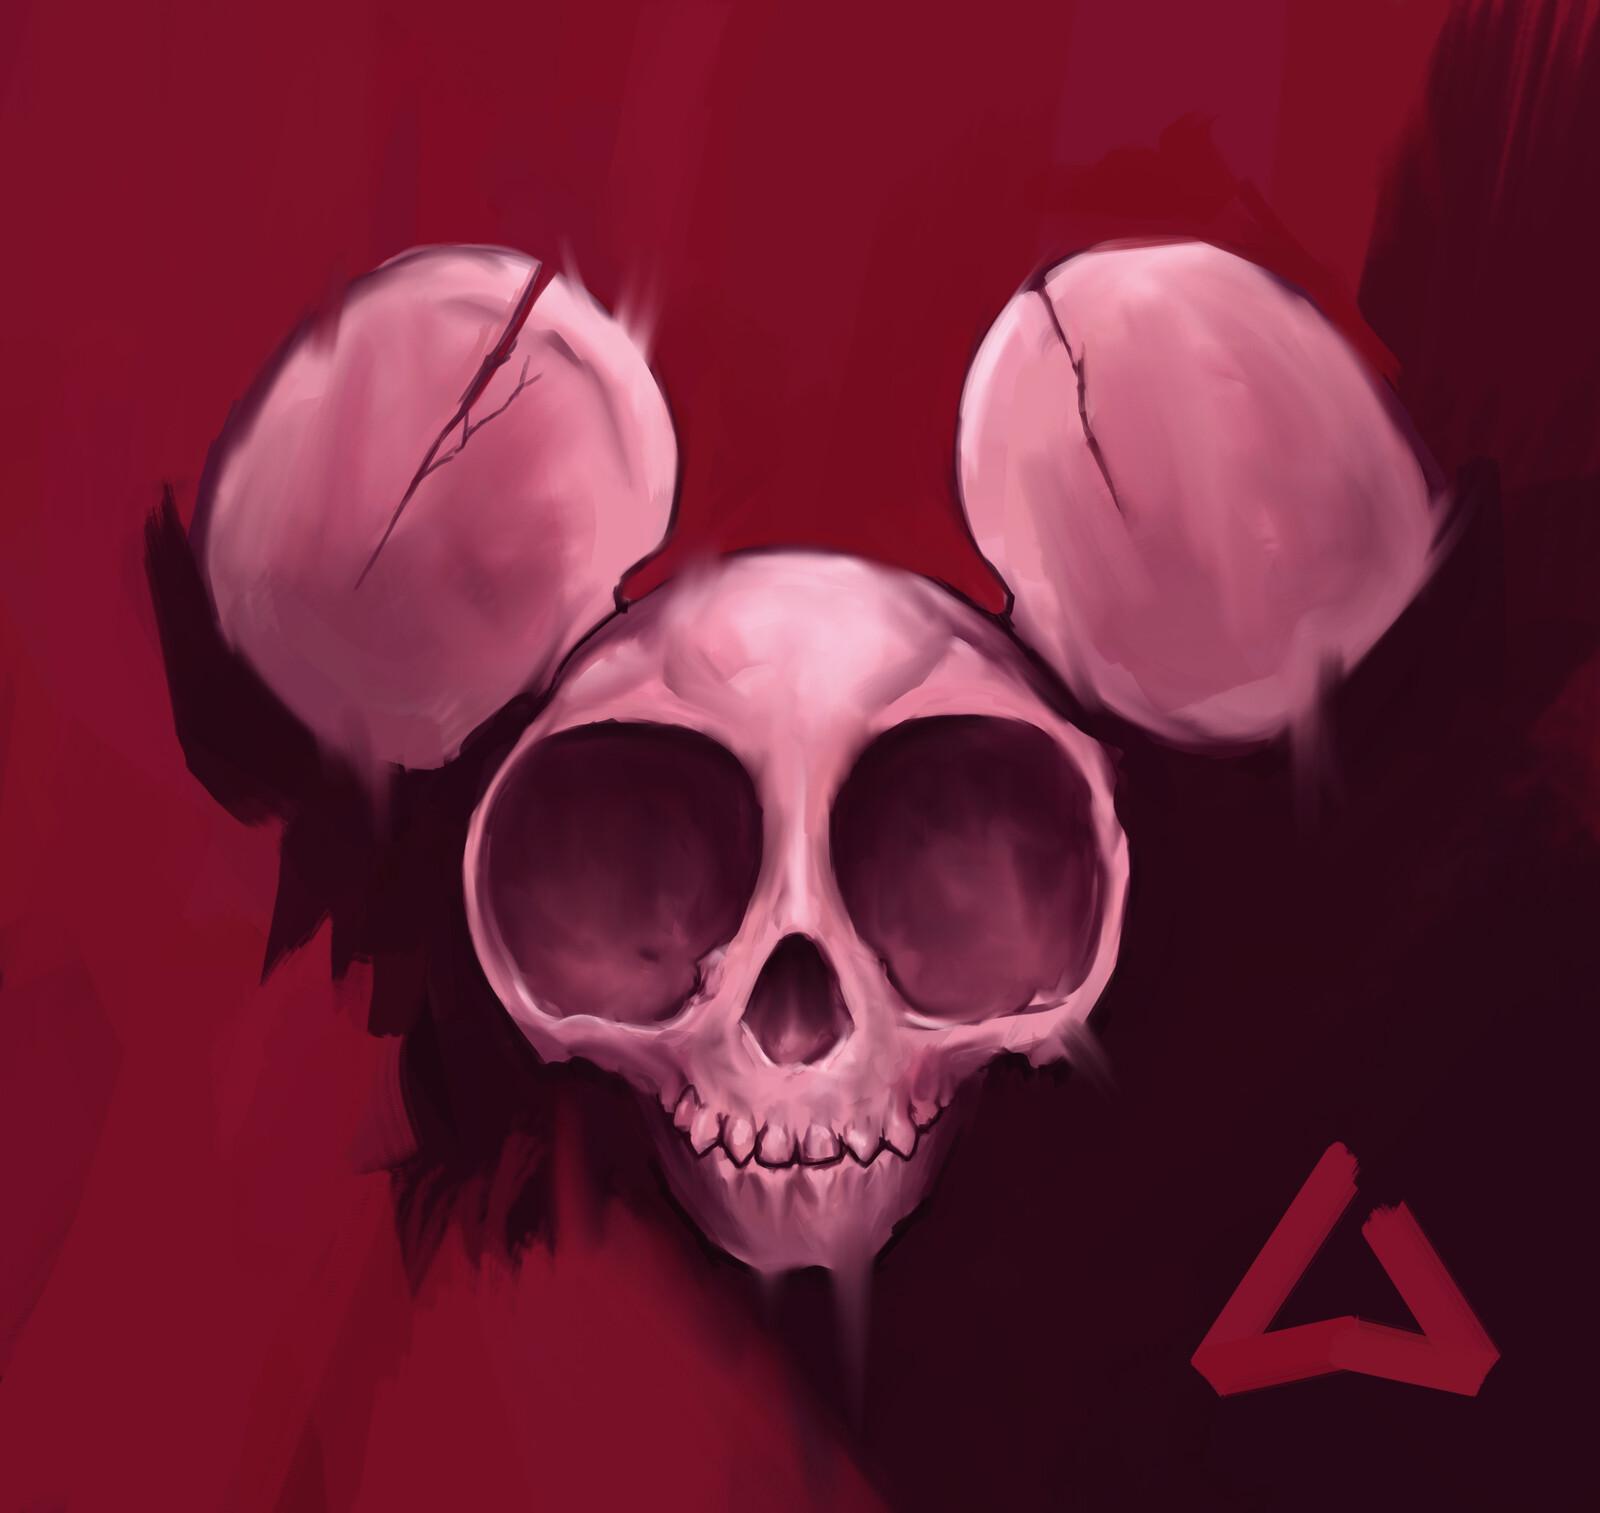 Mickey Mau5e